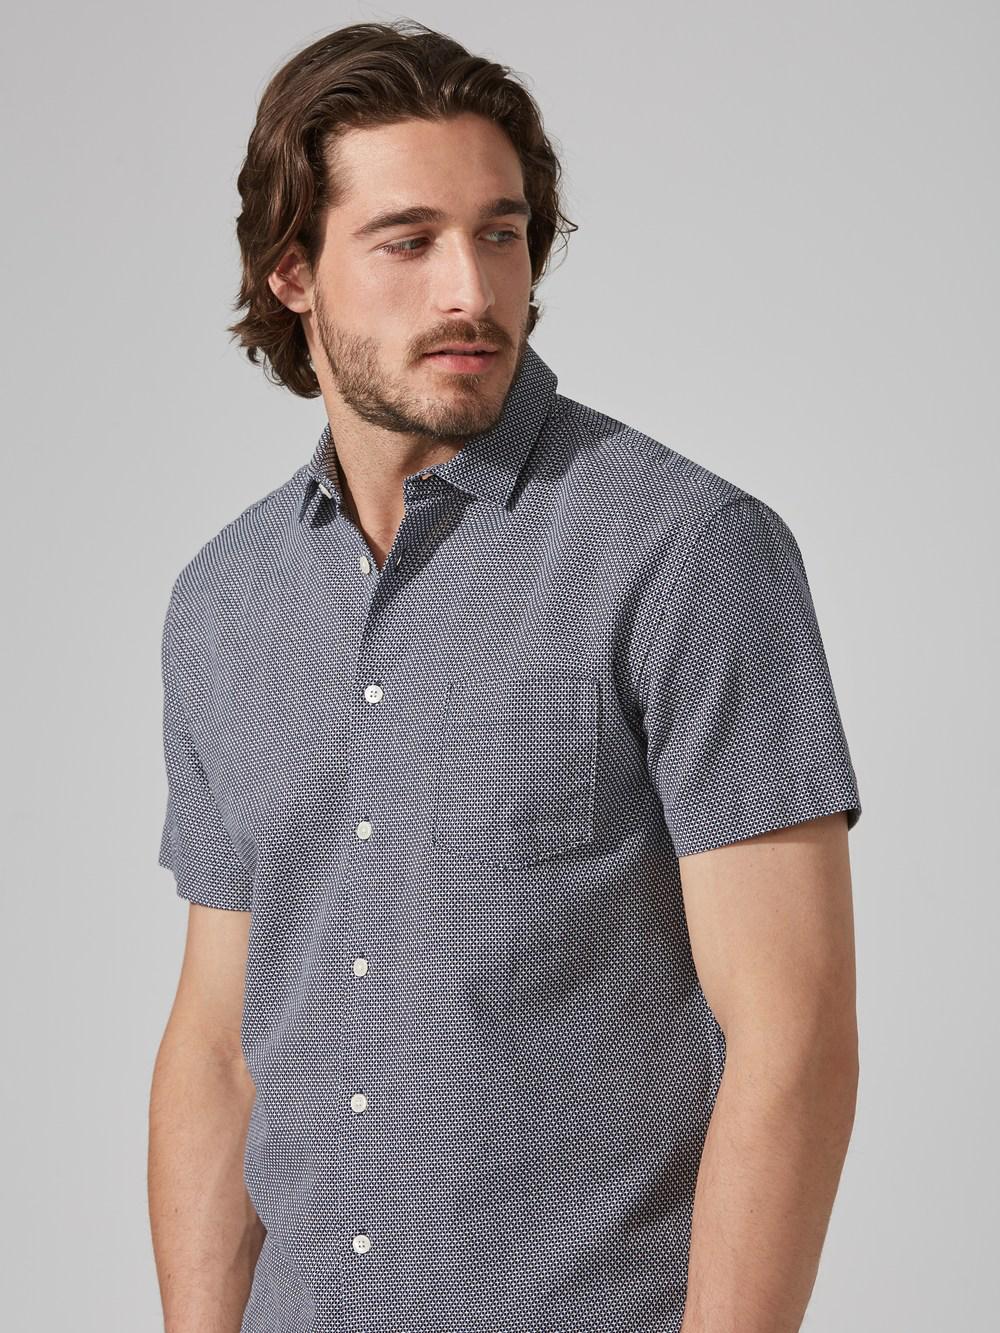 Frank + Oak Jacquard-cotton Short-sleeve Shirt In Navy